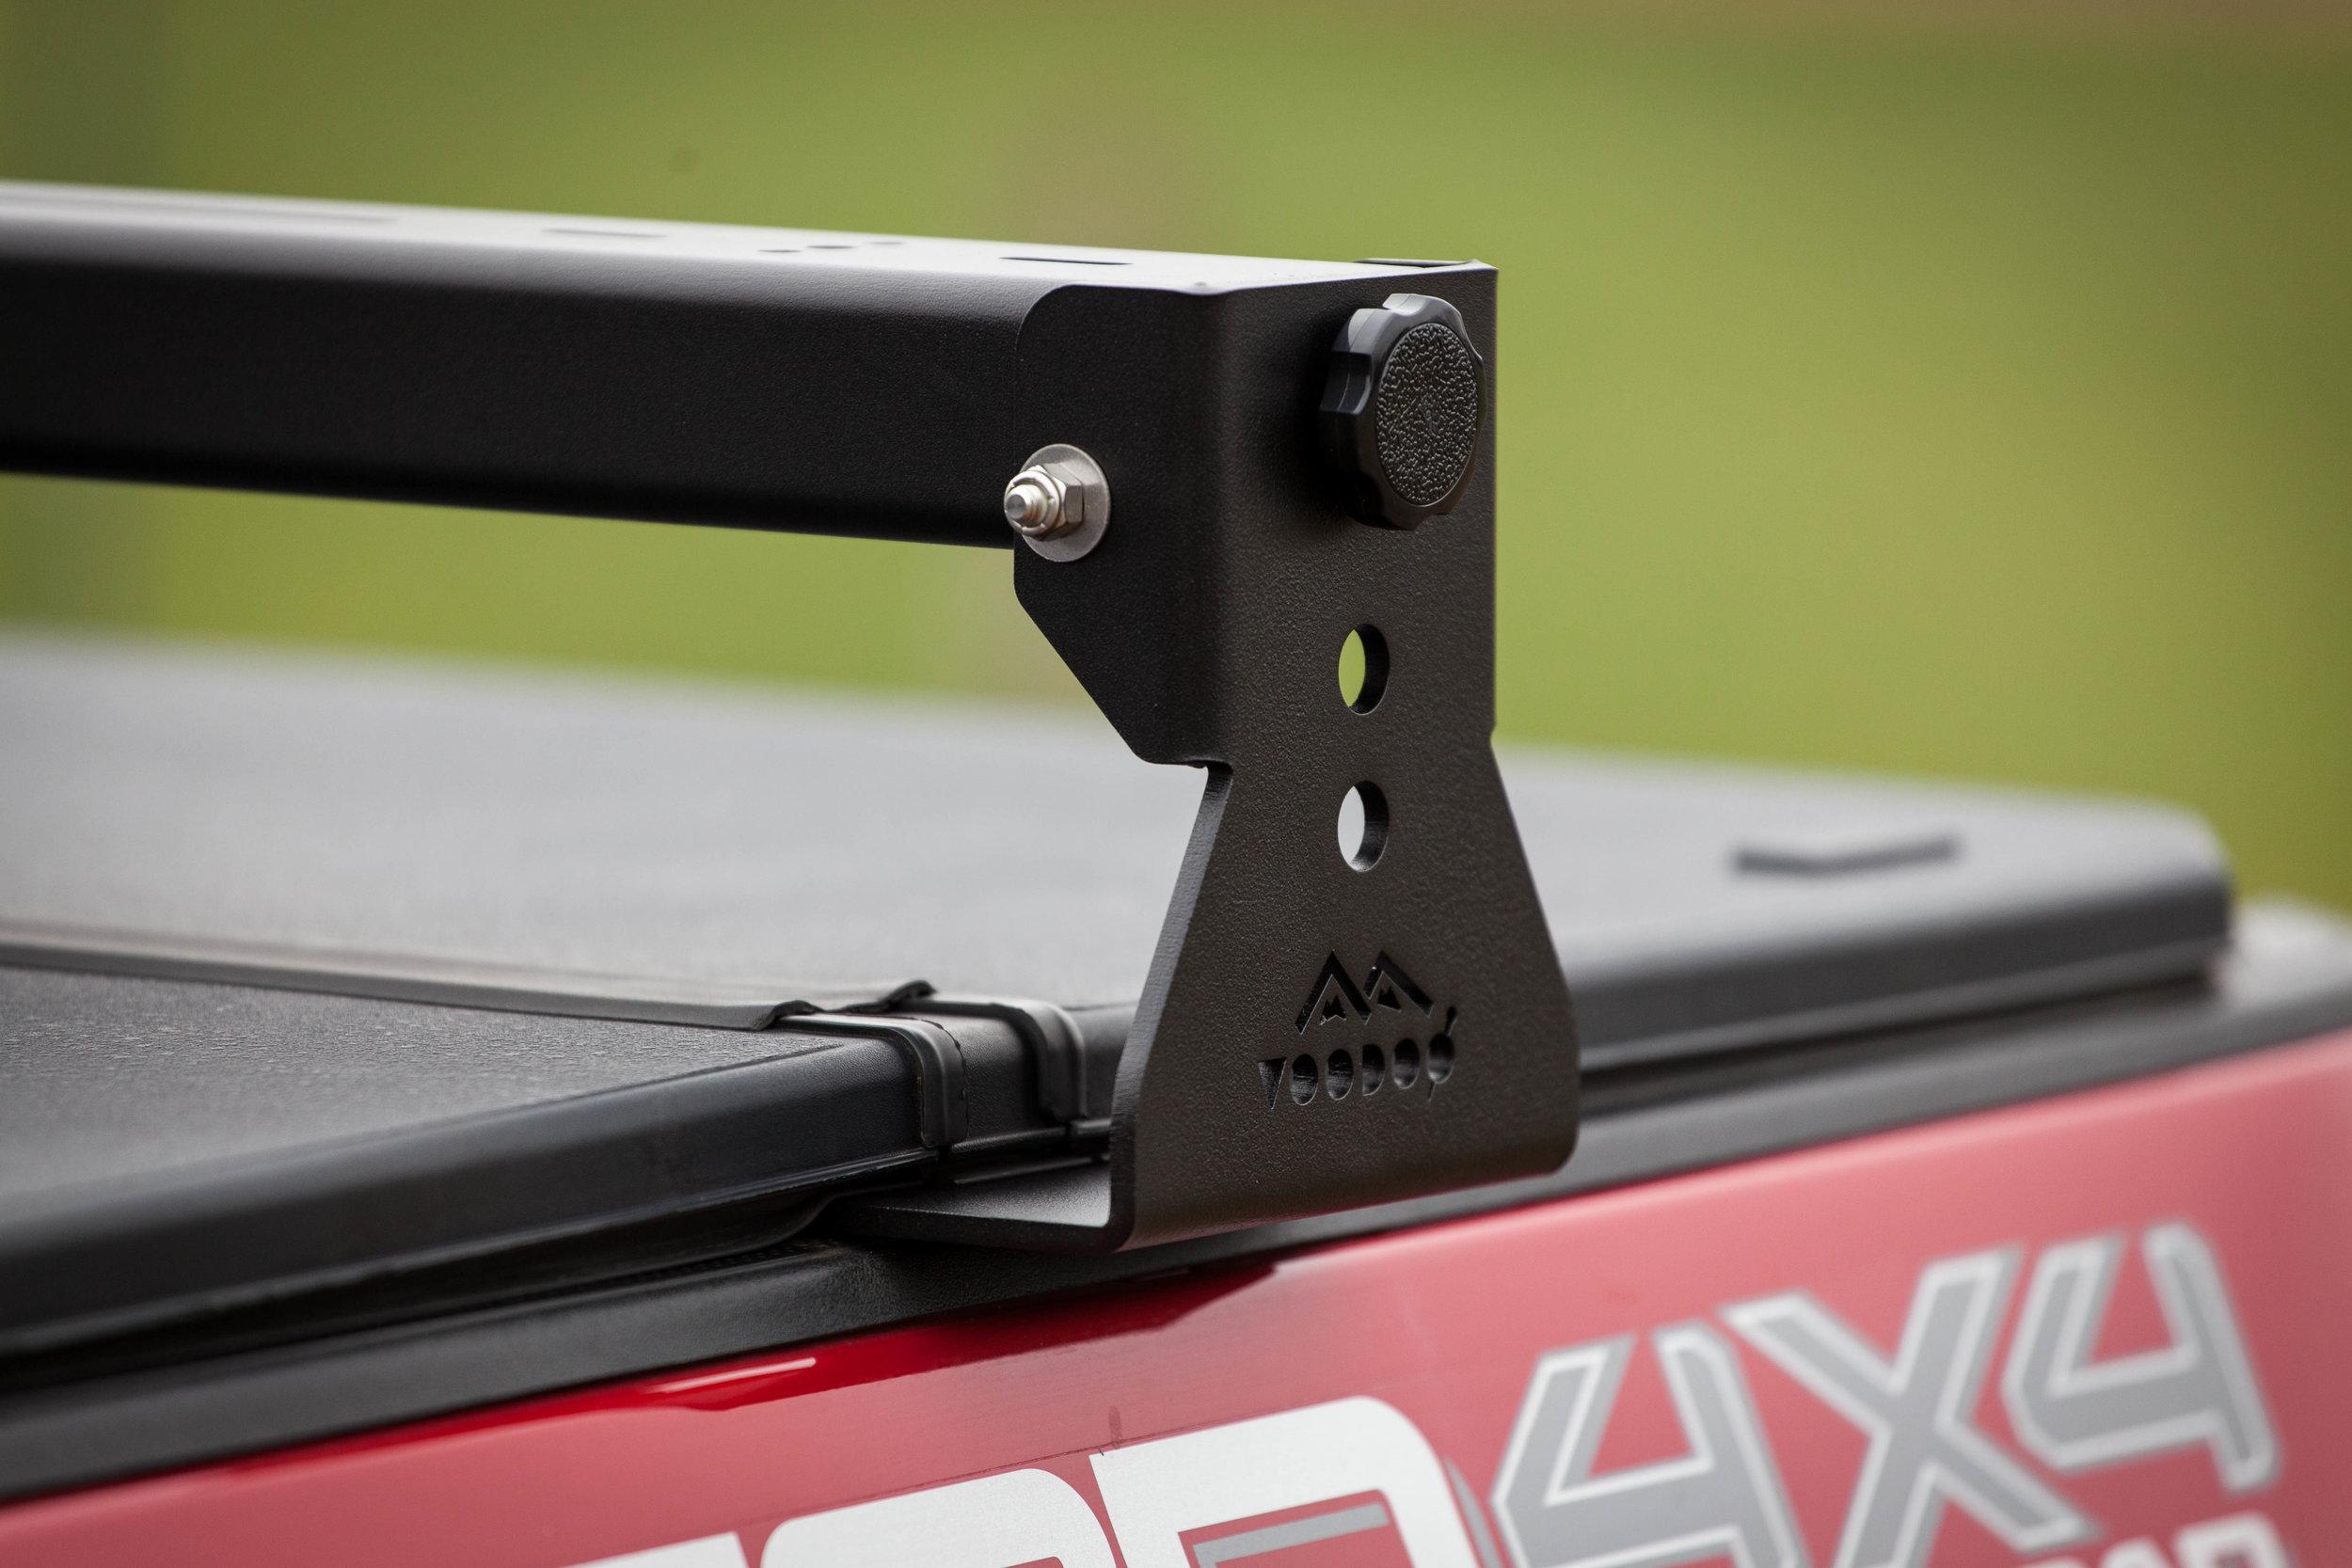 Universal Truck Crossbars For Tonneau Covers Fits All Trucks Kb